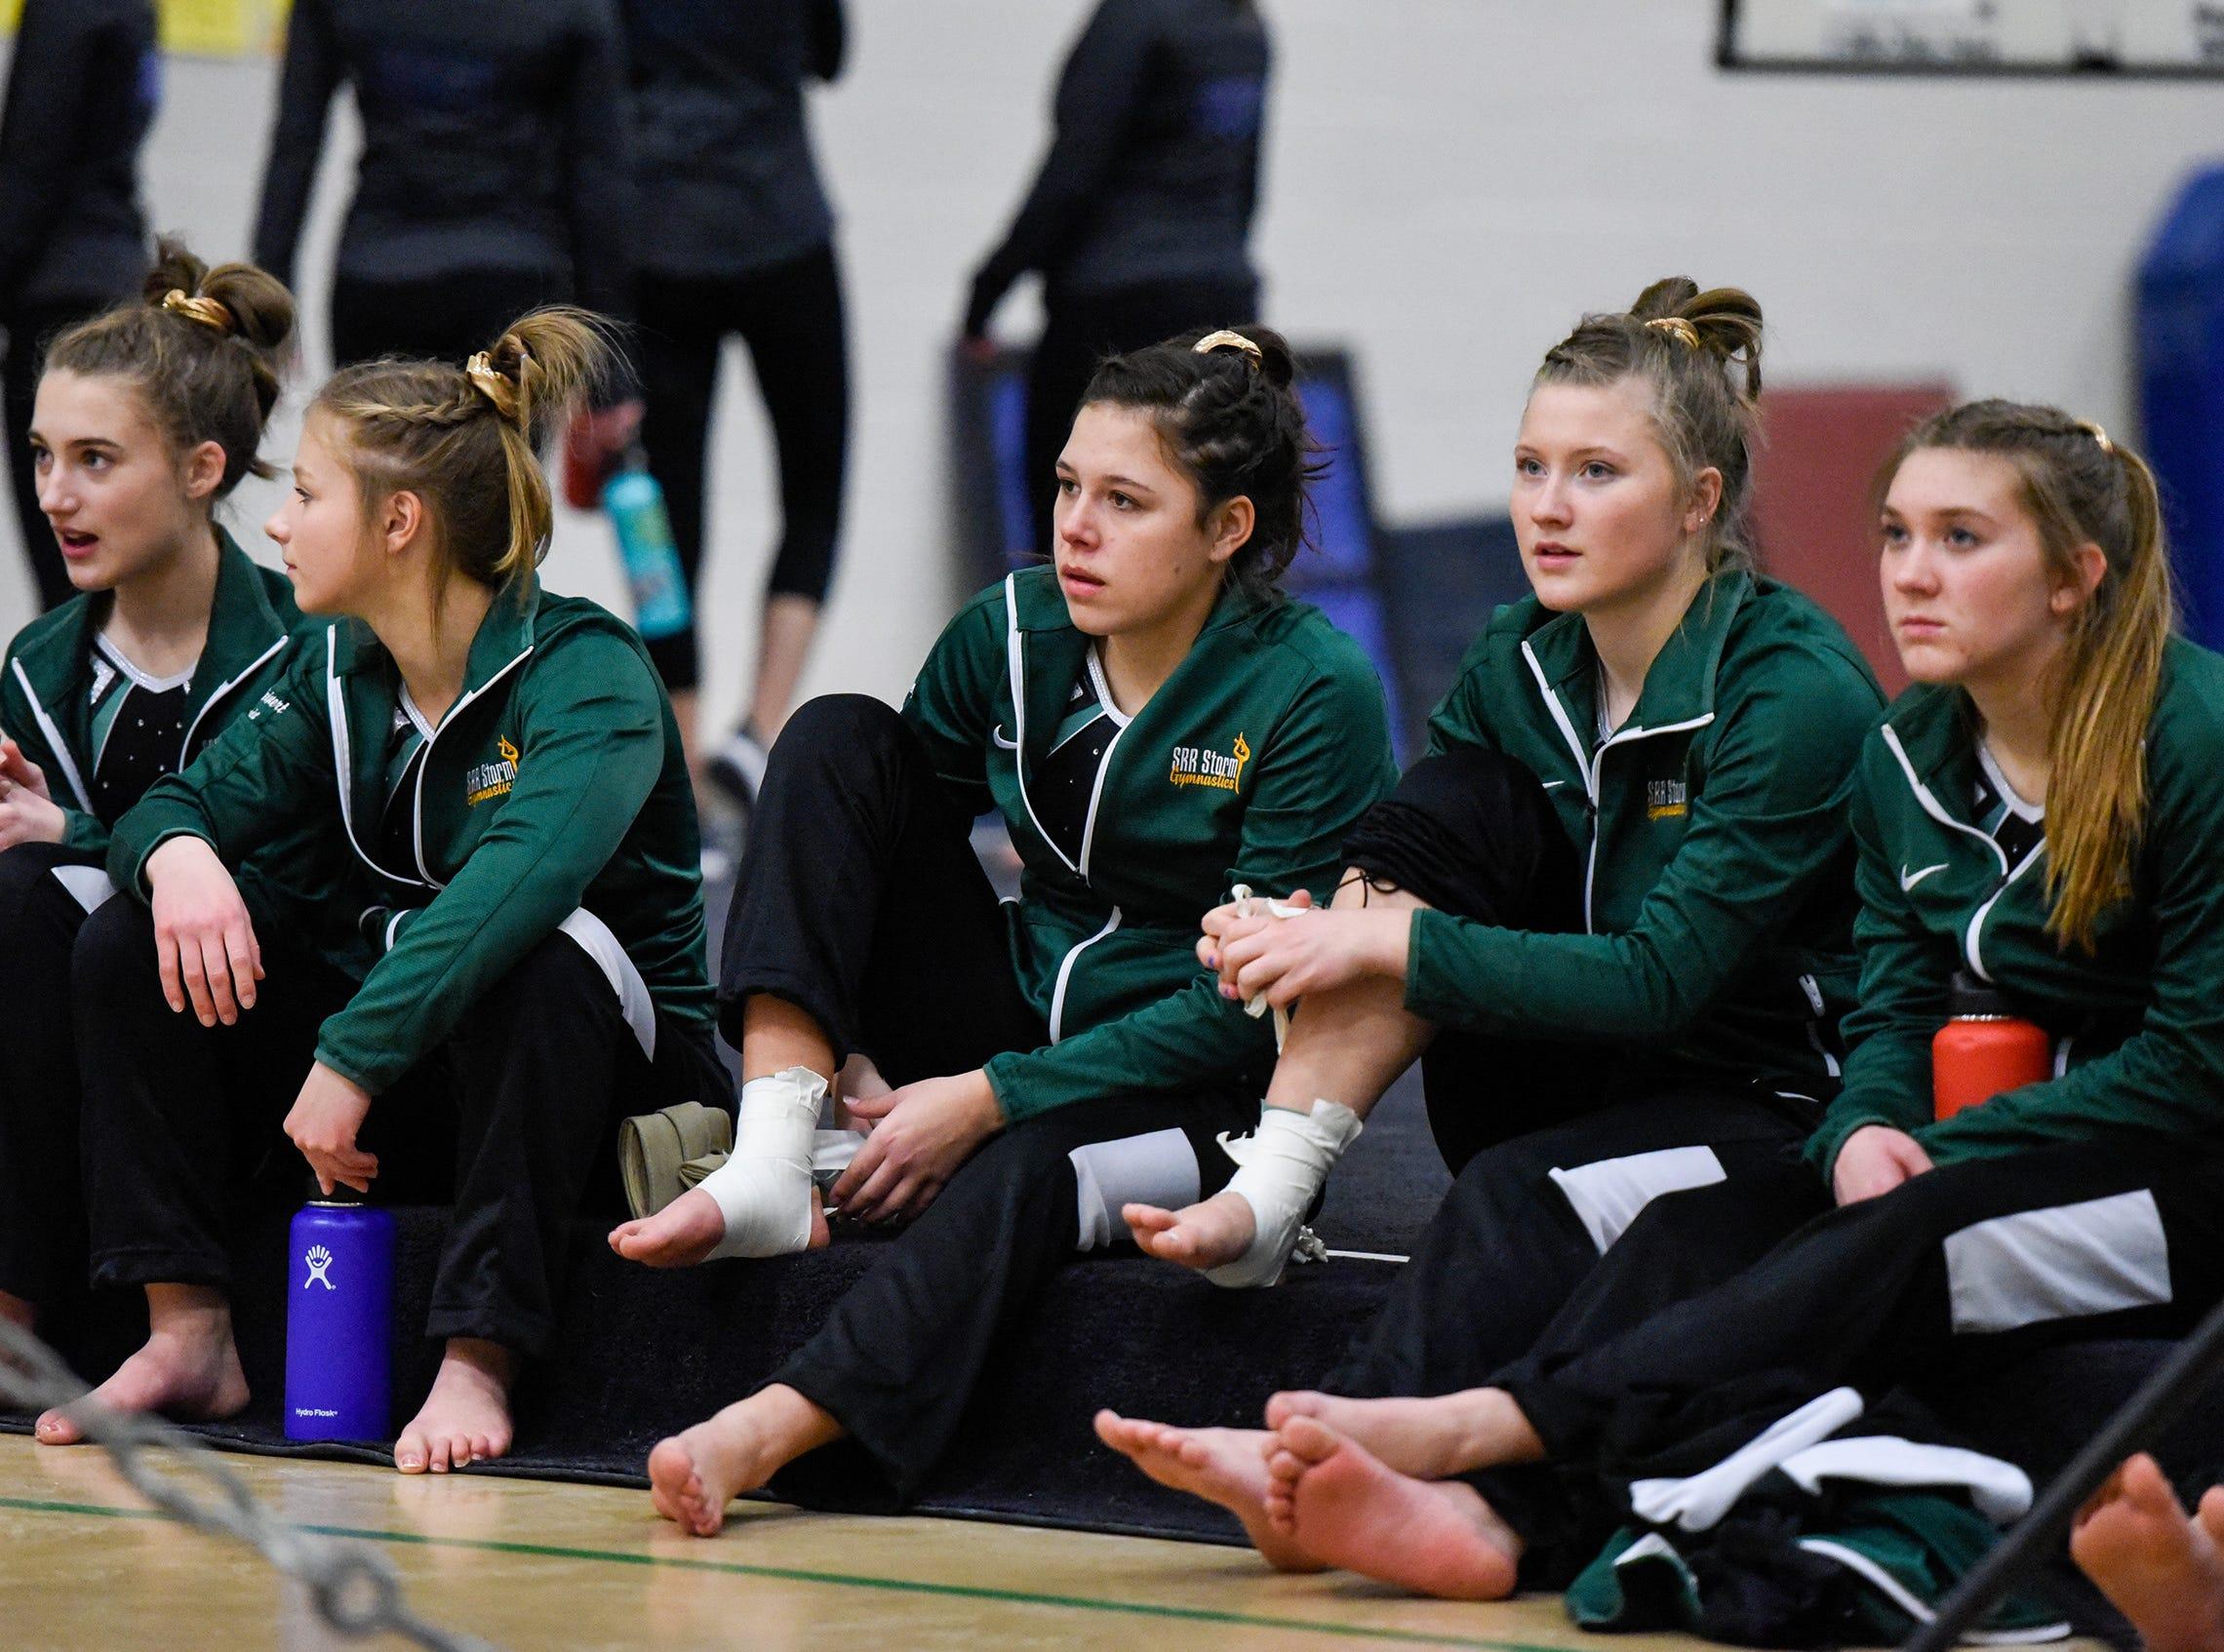 Sauk Rapids' gymnasts compete against  Sartell Thursday, Jan. 3, at the Sauk Rapids-Rice High School.